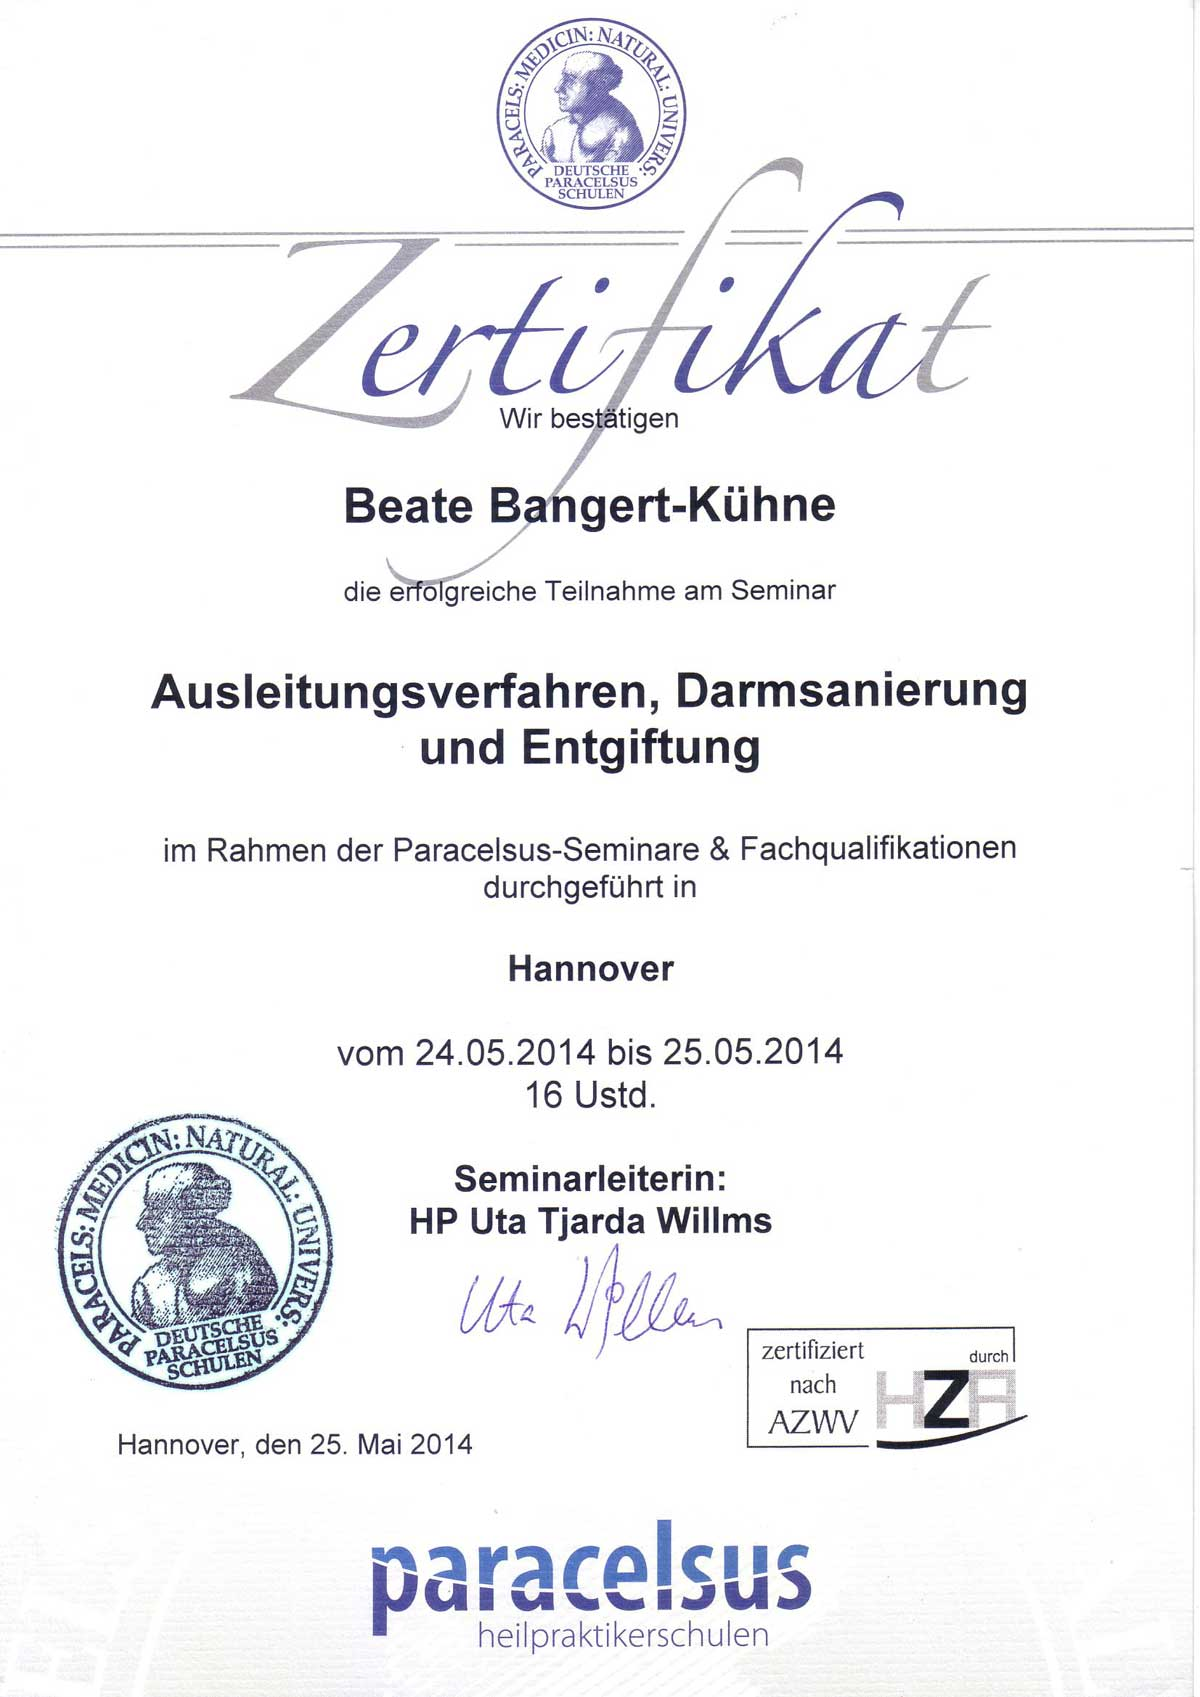 Ausleitungsverfahren, Darmsanierung, Entgiftung Kassel HP Bangert-Kühne